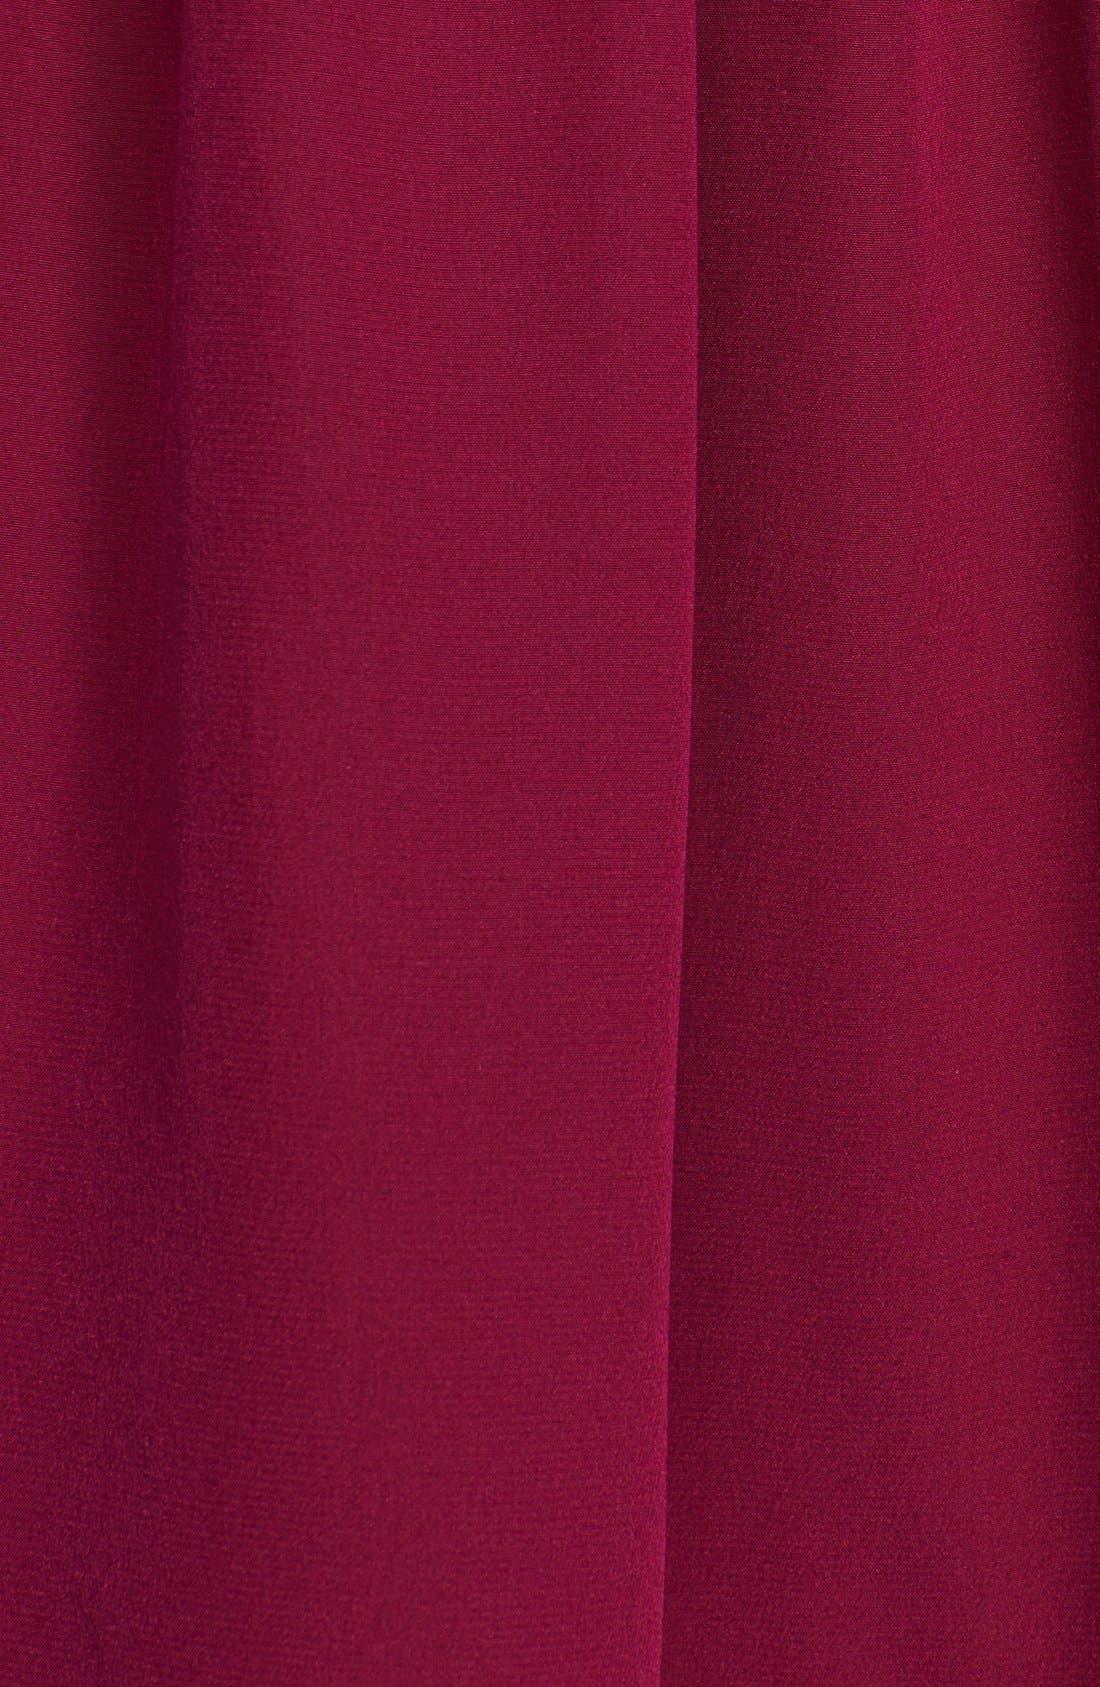 Alternate Image 3  - Elizabeth and James 'Avenue' Silk Skirt